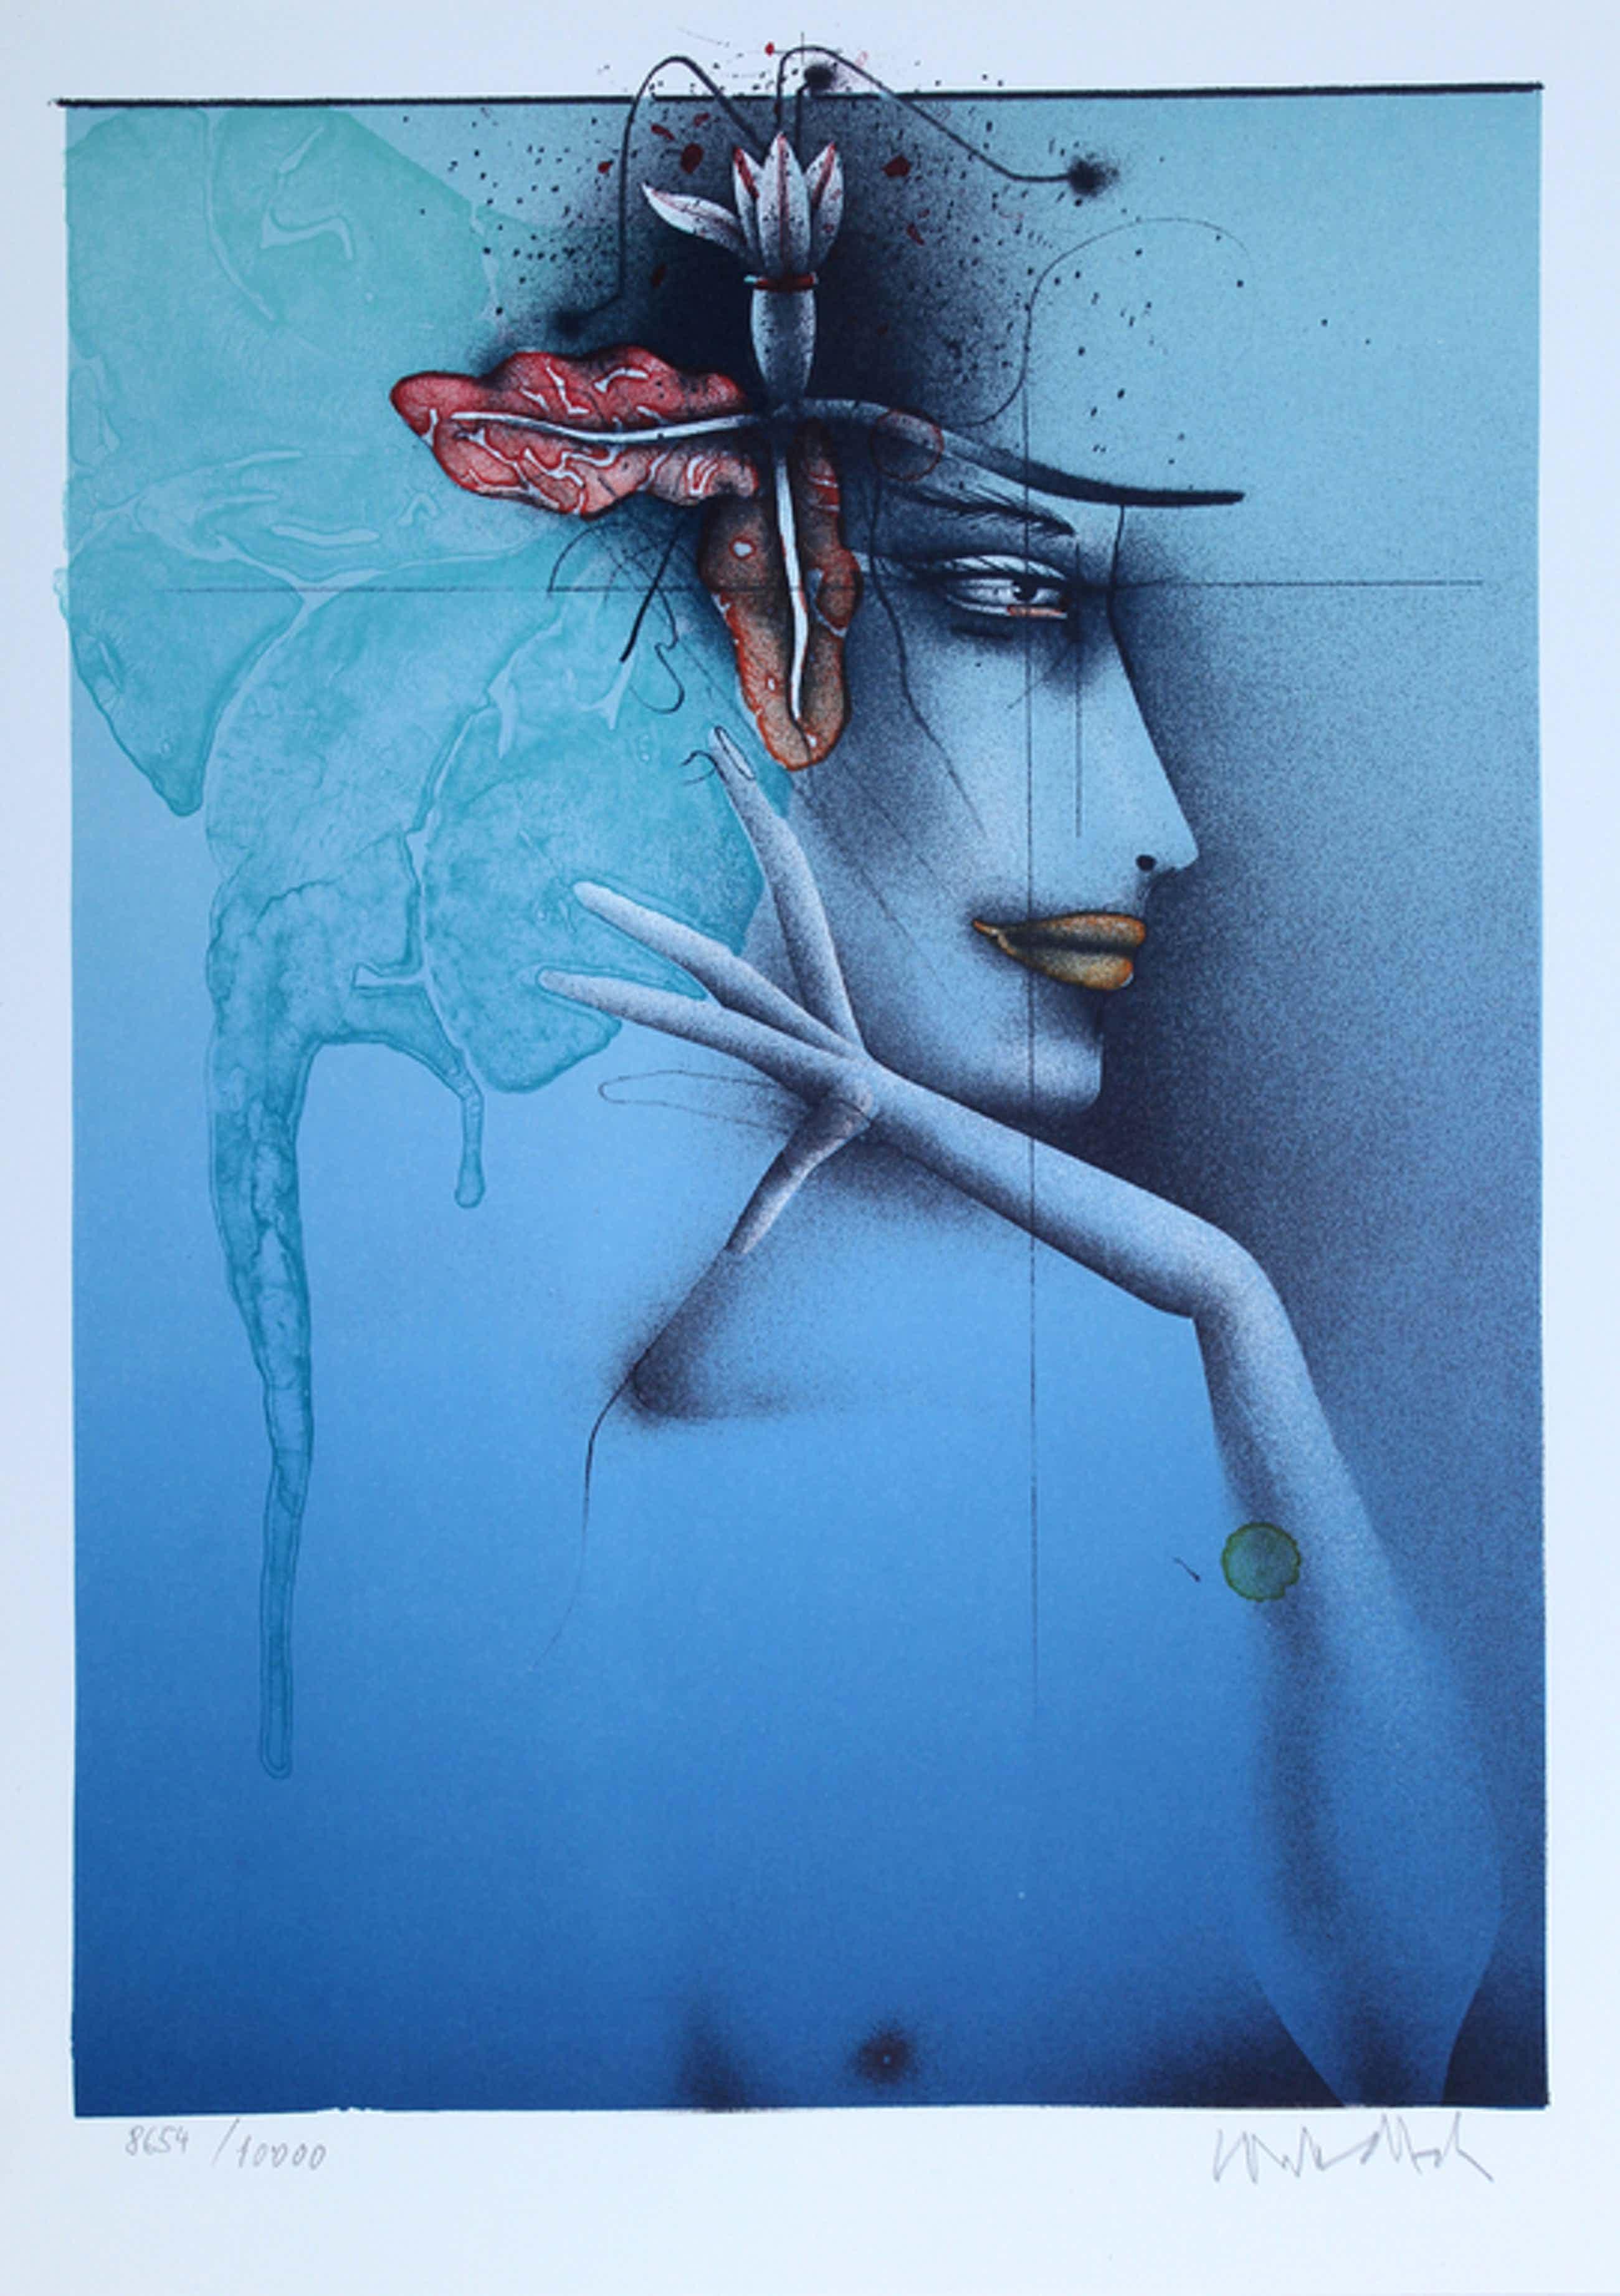 Paul Wunderlich - Handgesigneerde lithografie, Tête d'une Femme (Bleu) kopen? Bied vanaf 69!